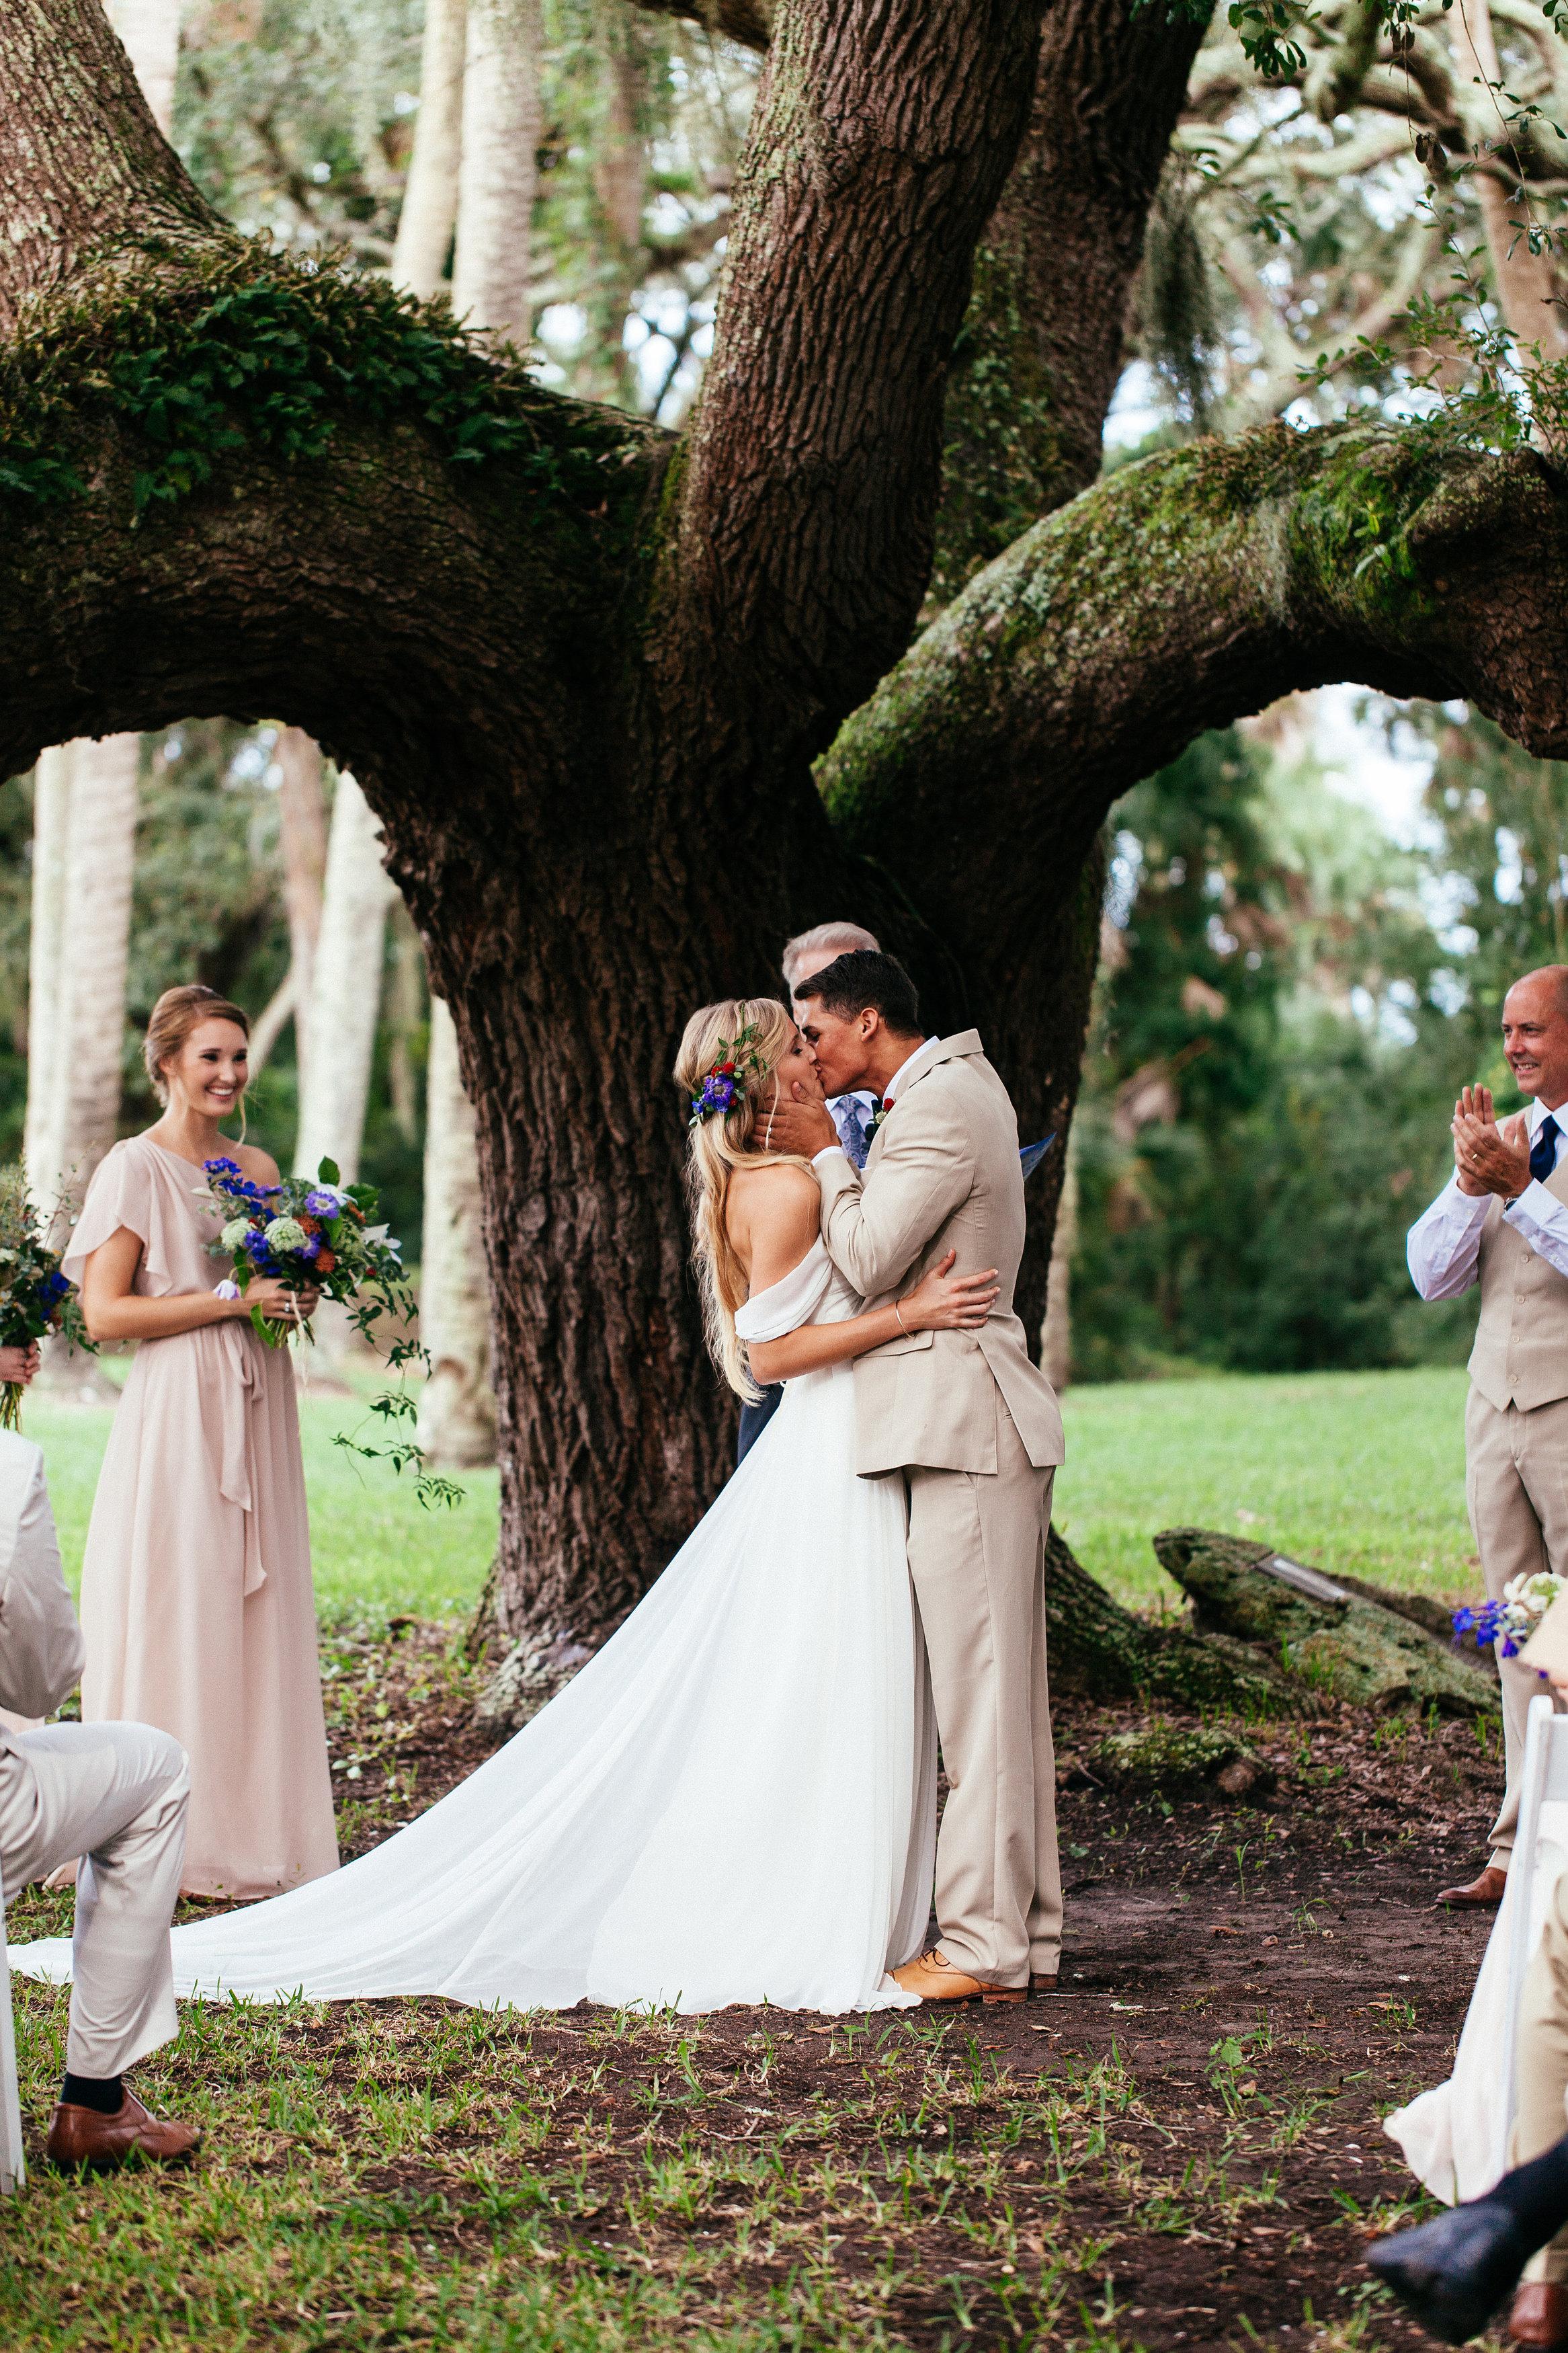 christina-karst-photography-ivory-and-beau-bridal-boutique-sarah-seven-lafayette-boho-bride-boho-bridal-boutique-indie-bridal-boutique-savannah-bridal-boutique-savannah-wedding-dresses-savannah-bridal-gowns-15.jpg